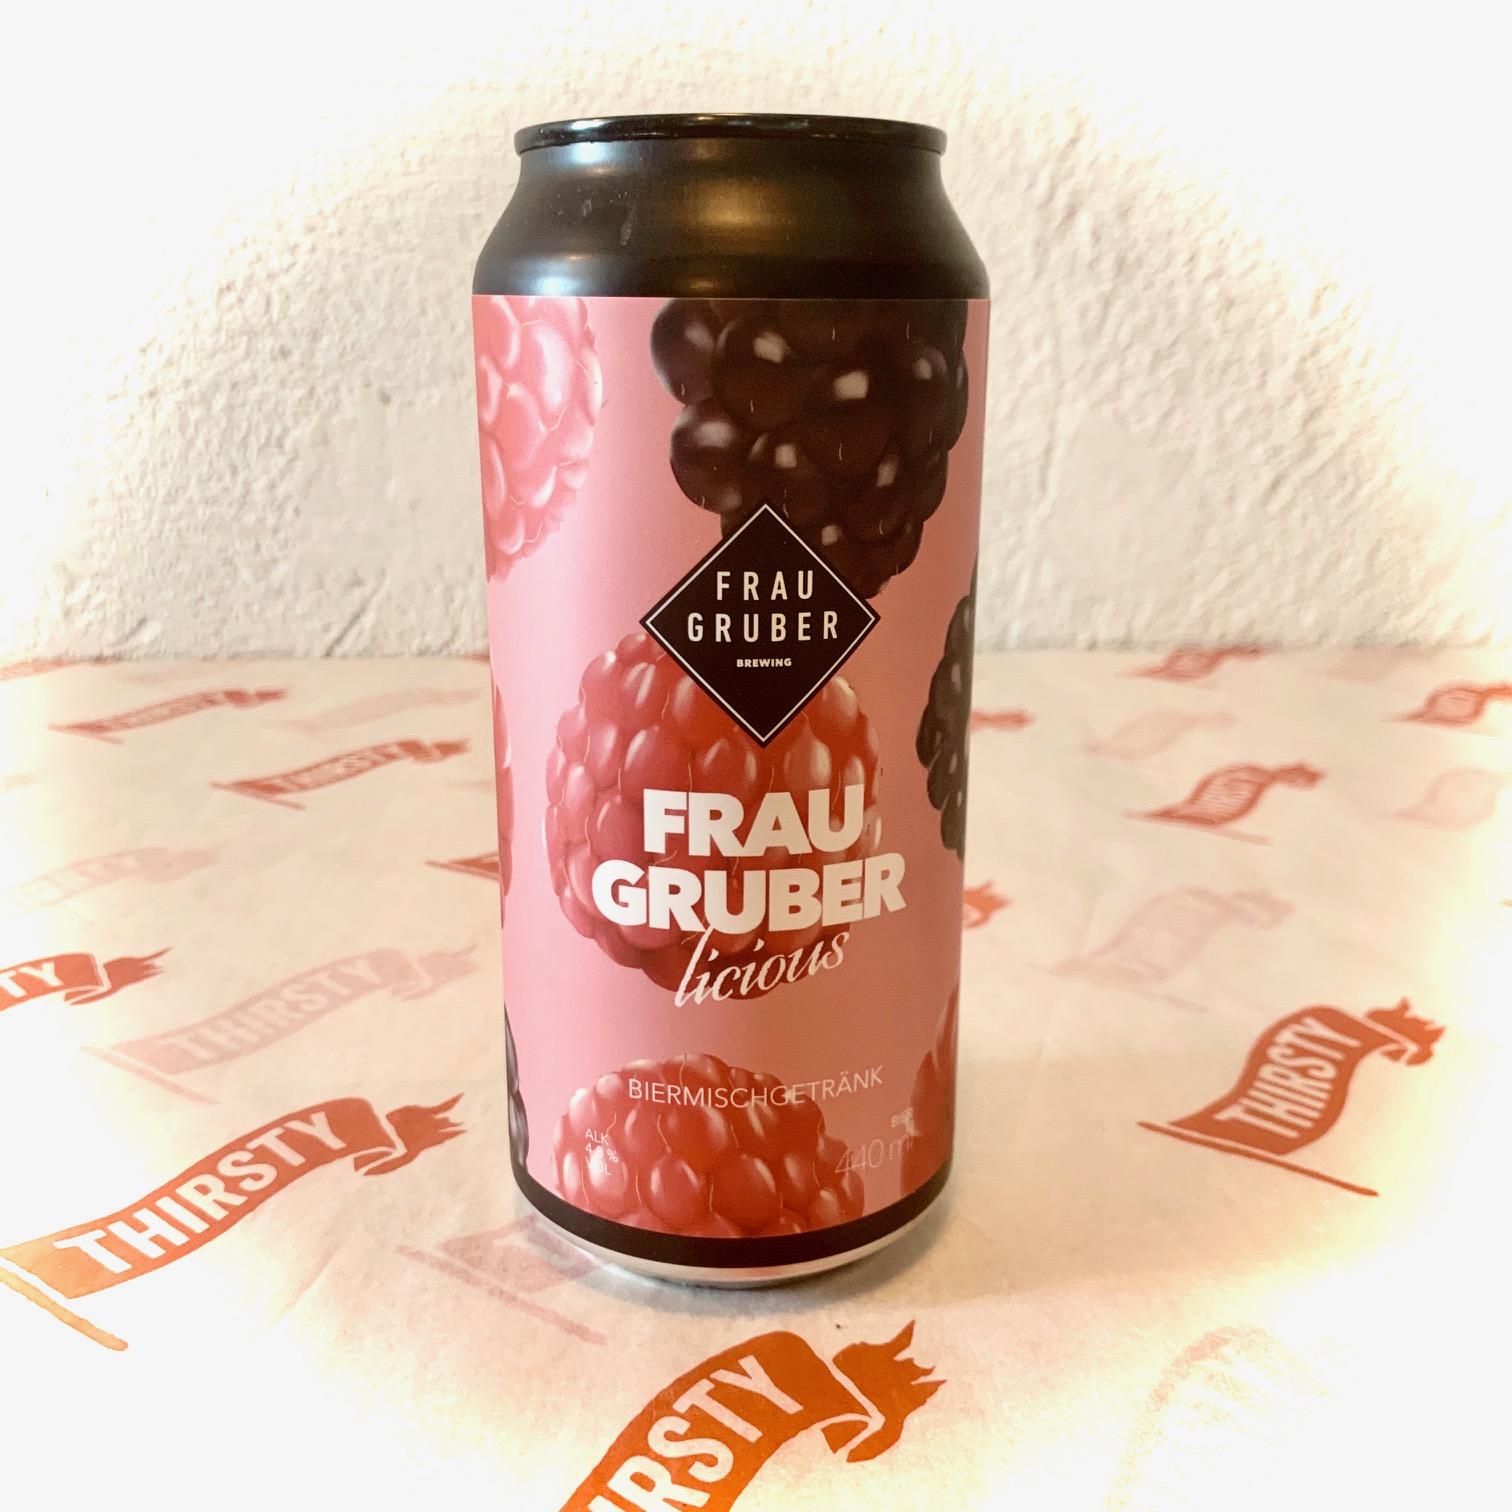 Frau Gruber | Fraugruberlicious | Raspberry & Blackberry Fruit Sour 4.5% 440ml